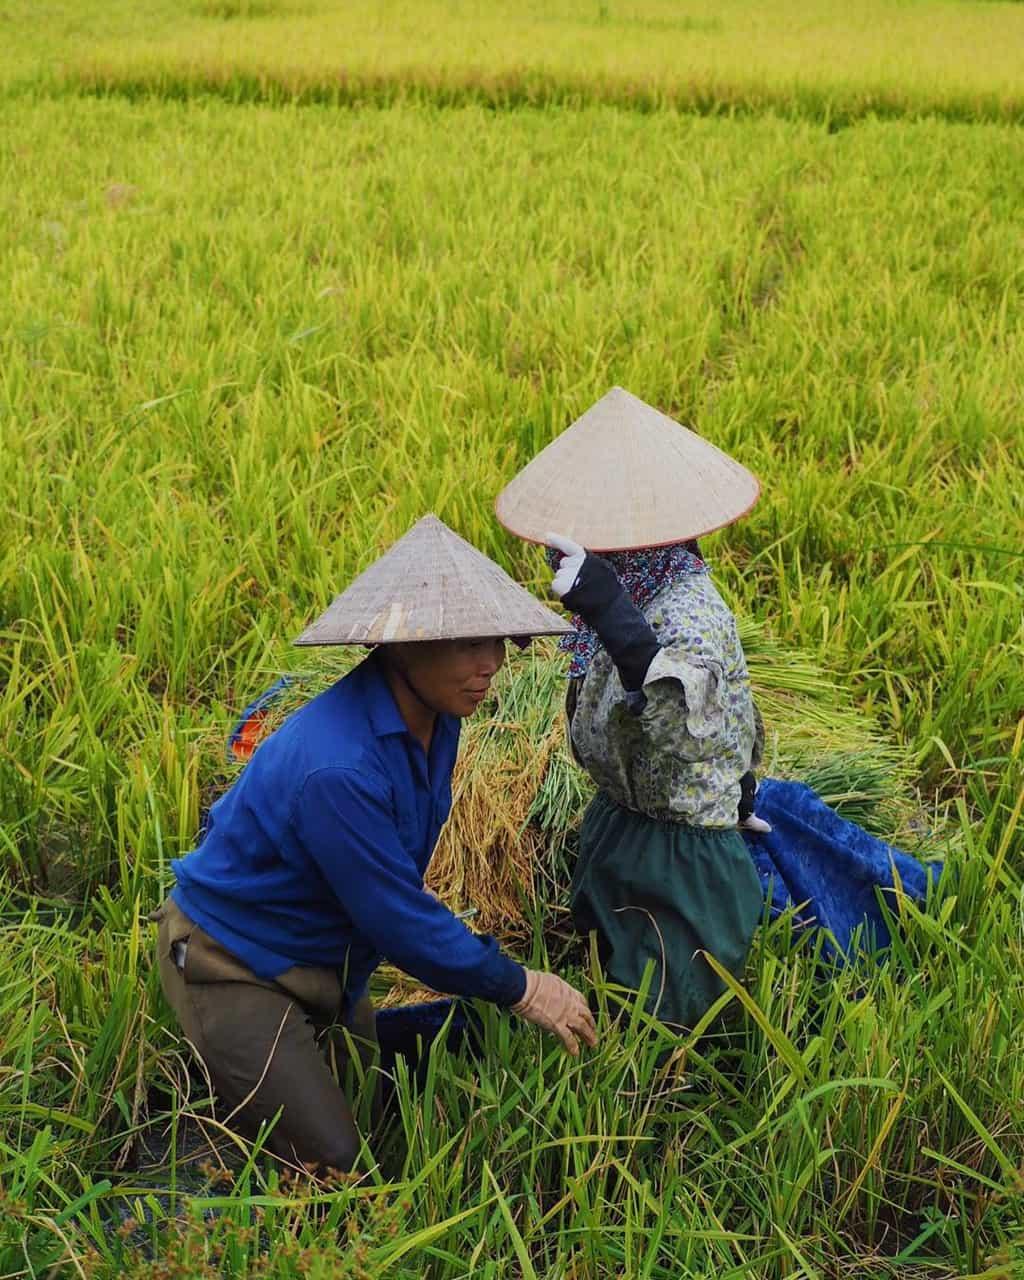 Vietnamese peole are hard working